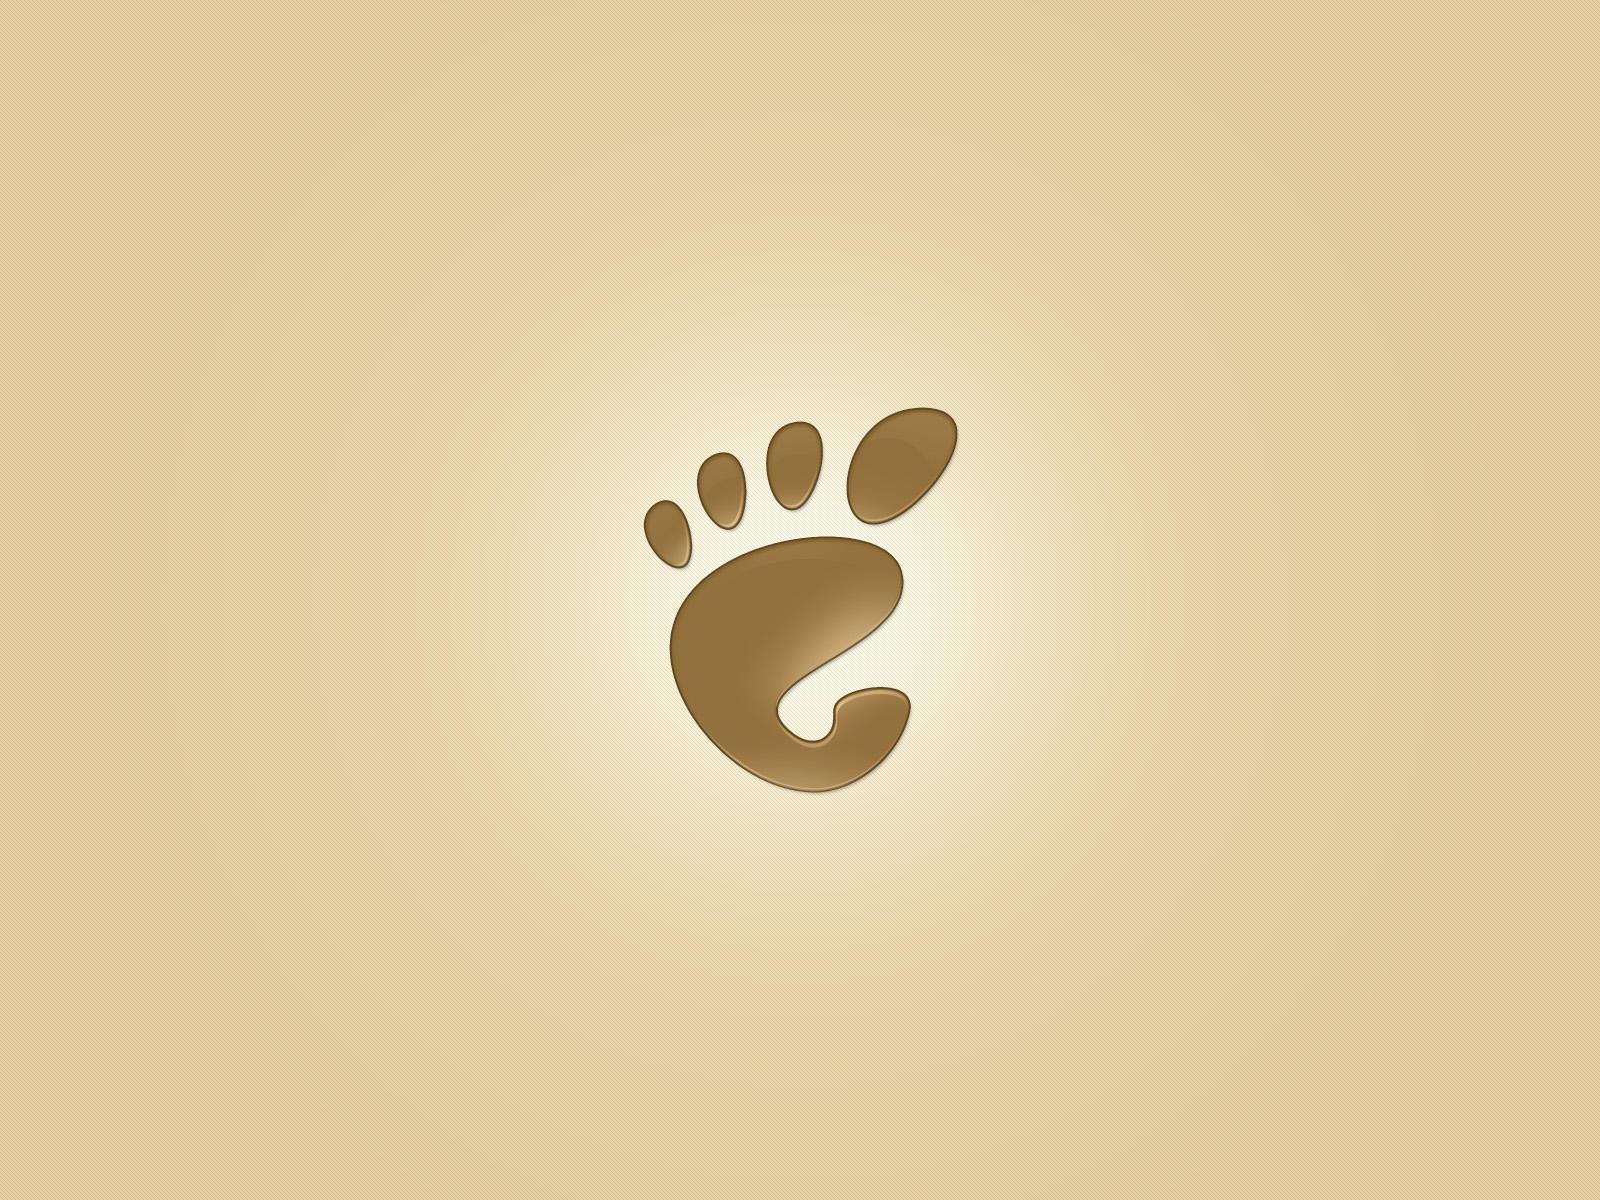 Gnome Ubuntu by grevenlx